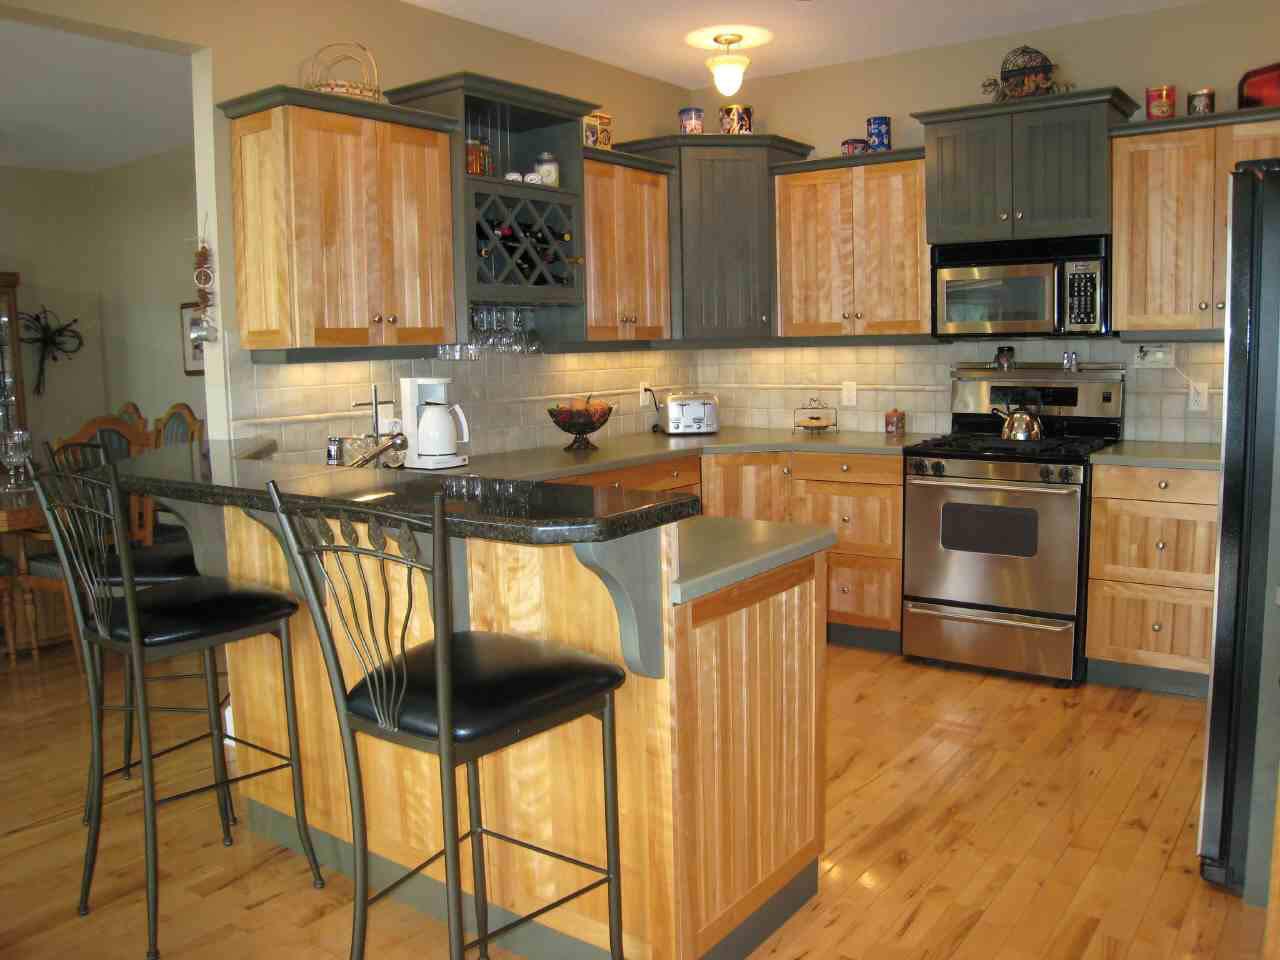 Small kitchen pantry cabinet Photo - 8